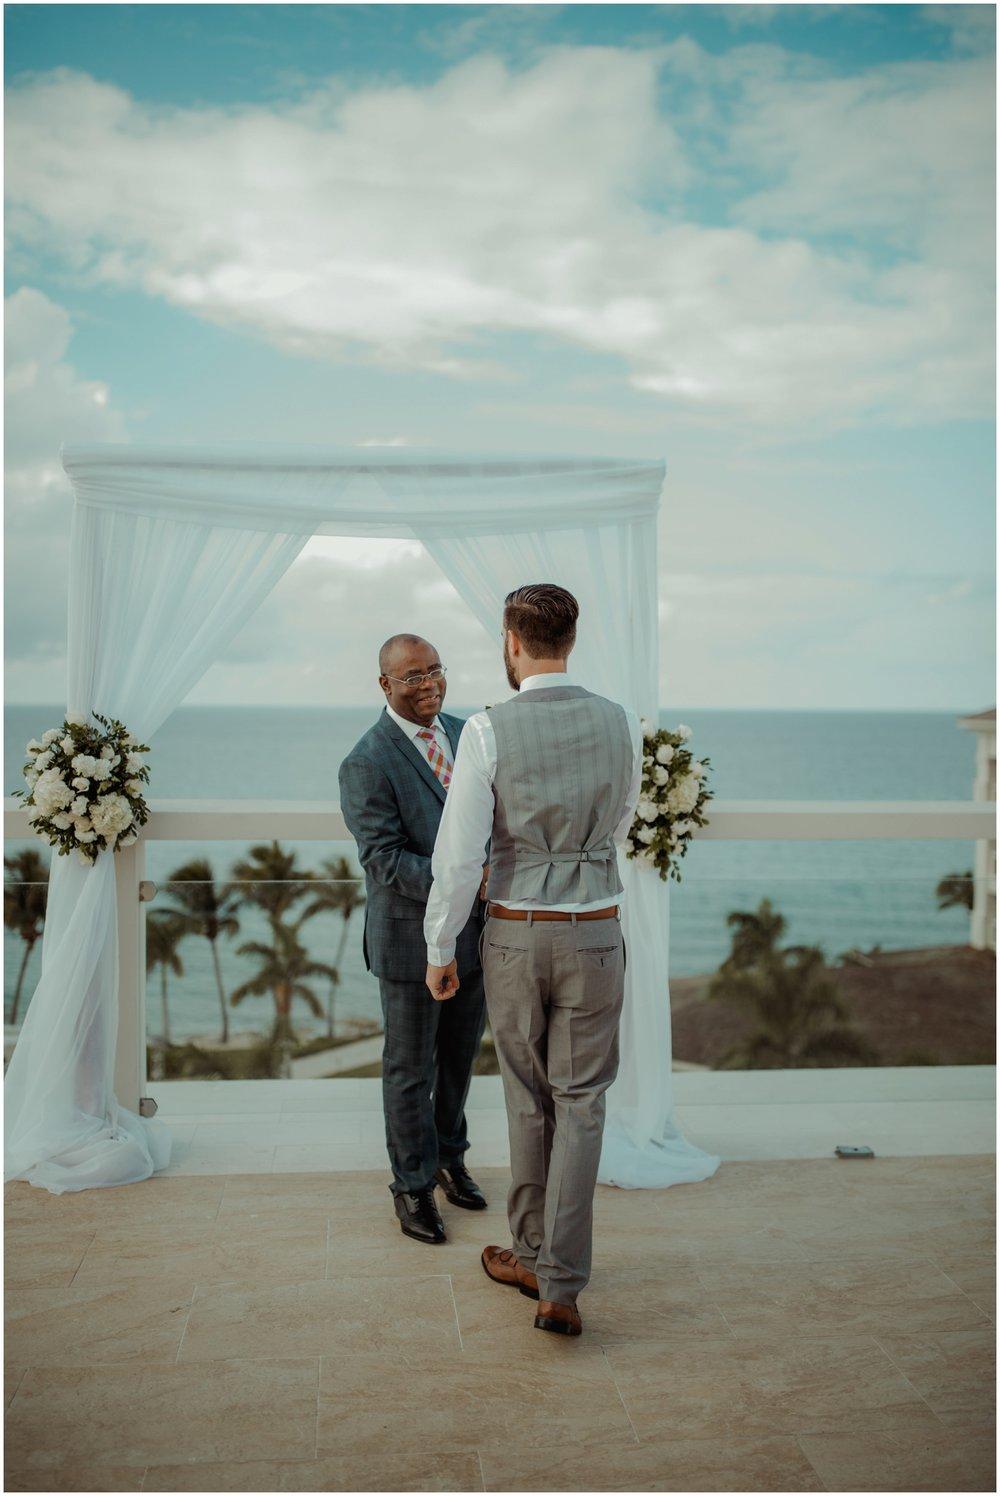 milwaukee-wedding-photographer-hyatt-ziva-rose-hall-montego-bay-wedding_0112.jpg